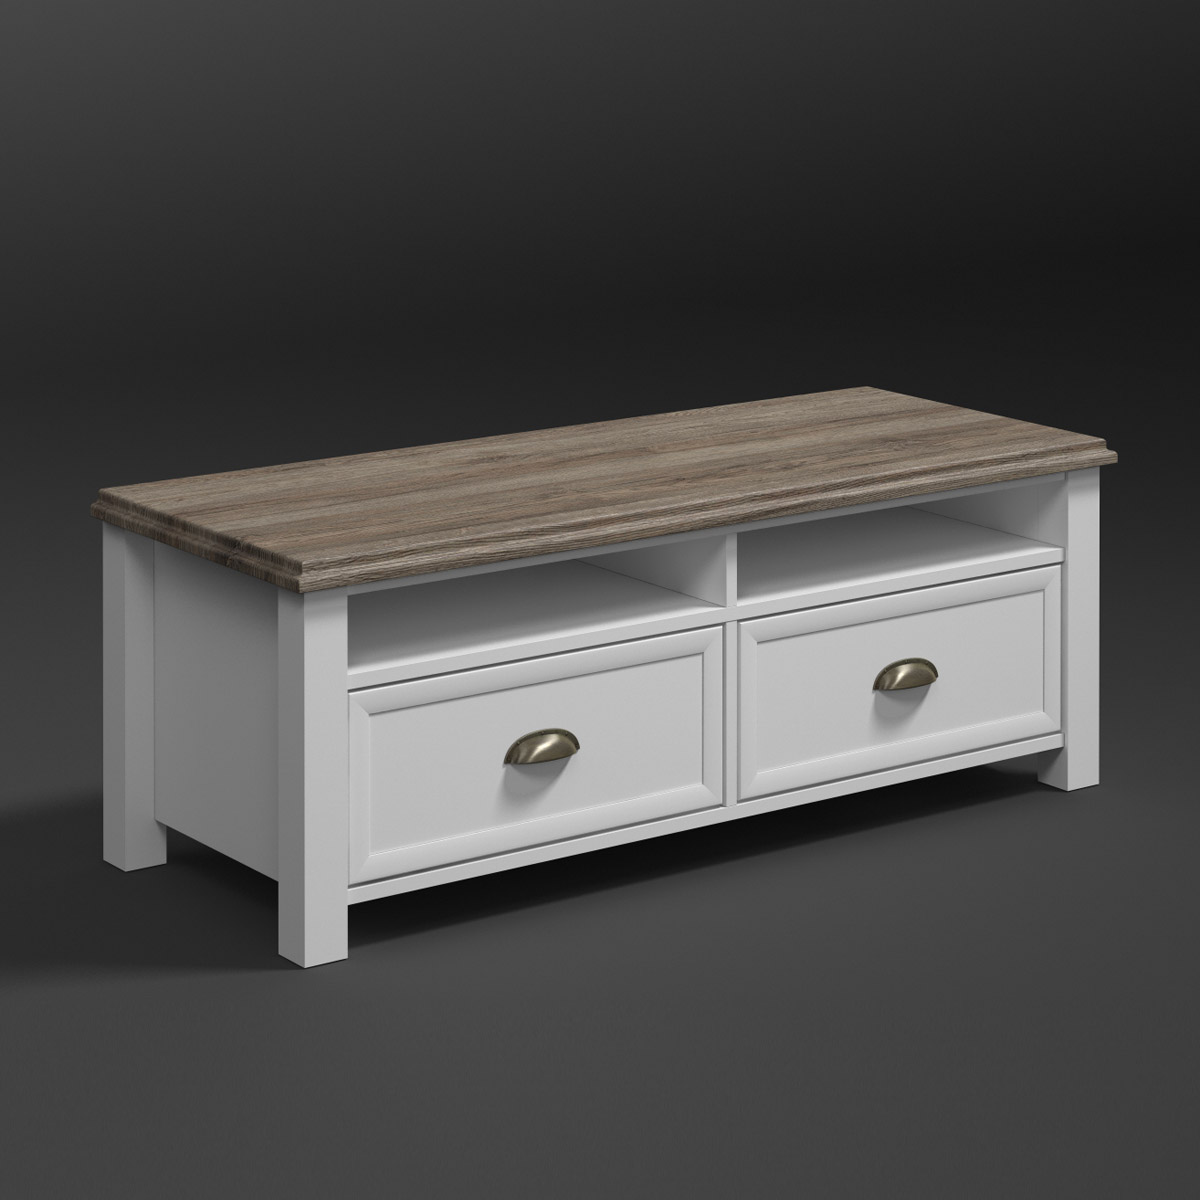 tv board chateau lowboard unterschrank wei und san remo. Black Bedroom Furniture Sets. Home Design Ideas